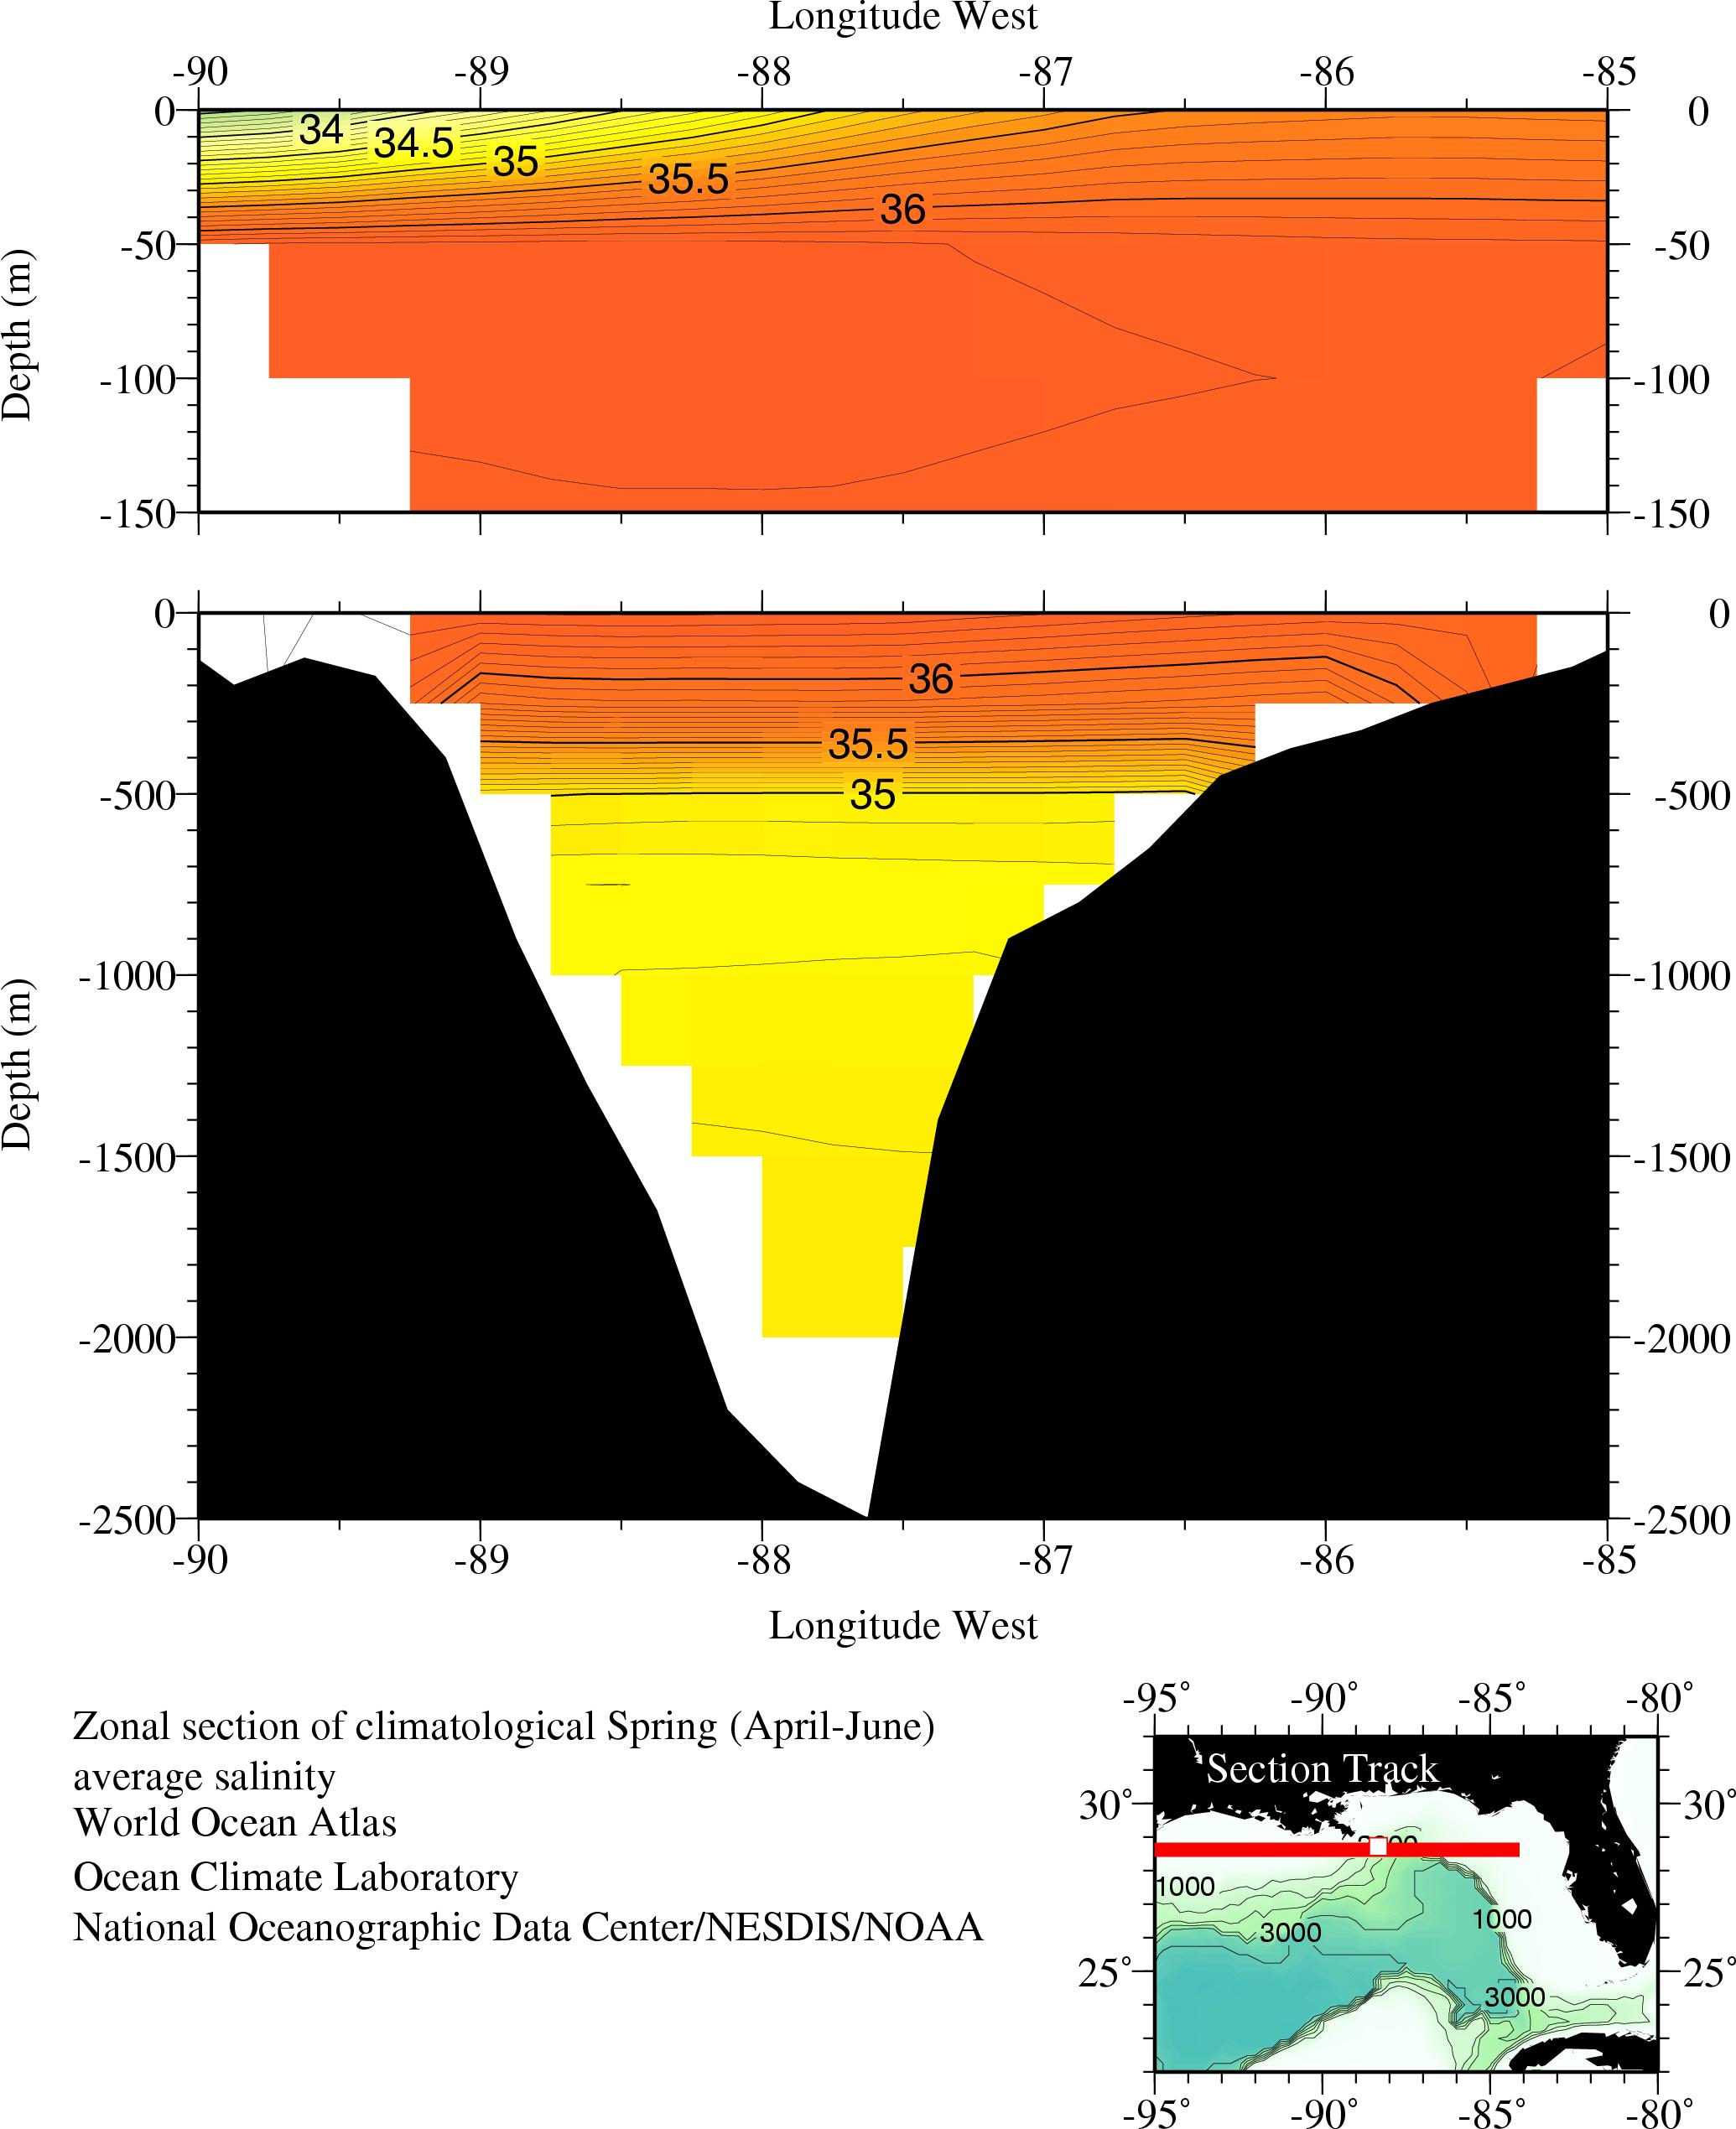 Average salinity, Zonal